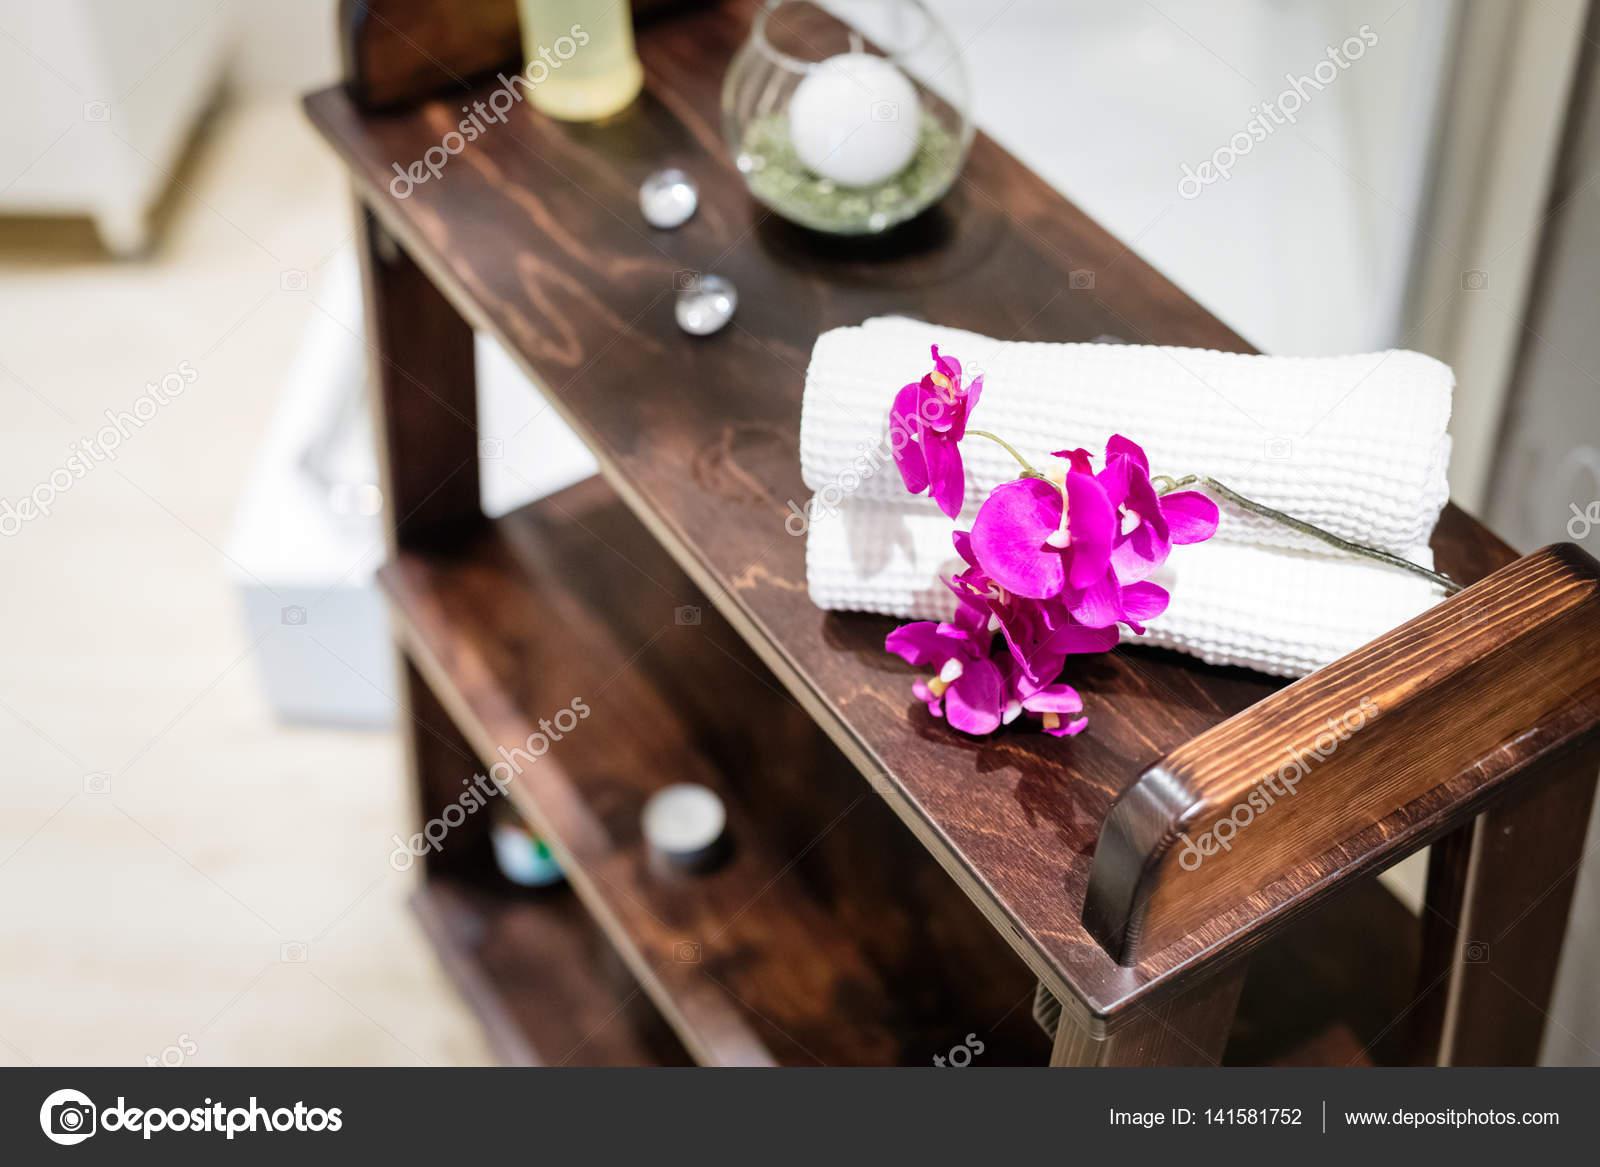 Massage Salon Dekoration — Stockfoto © nd3000 #141581752